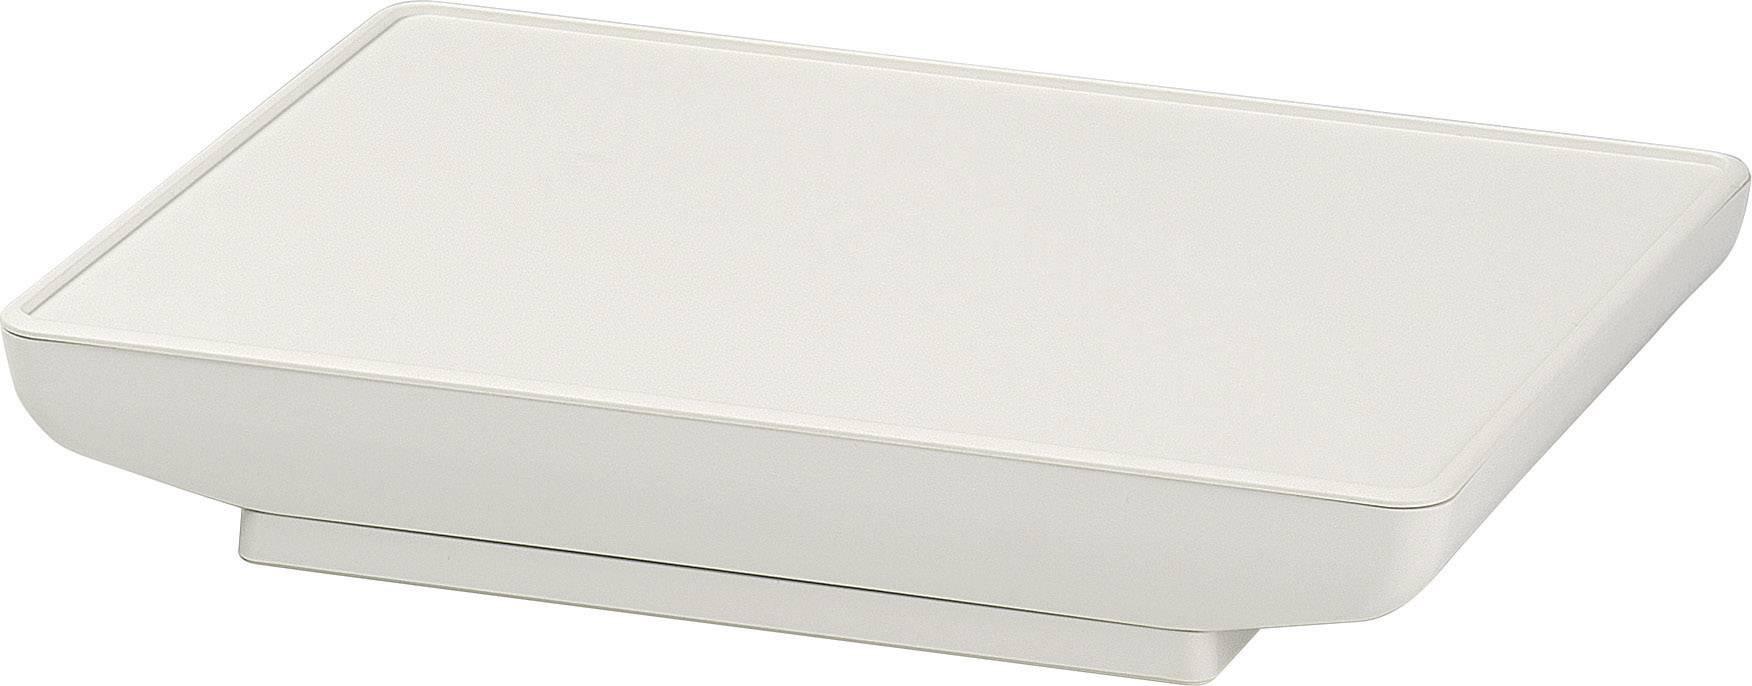 Pultové pouzdro plastové OKW D4044127, (d x š x v) 166 x 225 x 37 mm, šedá